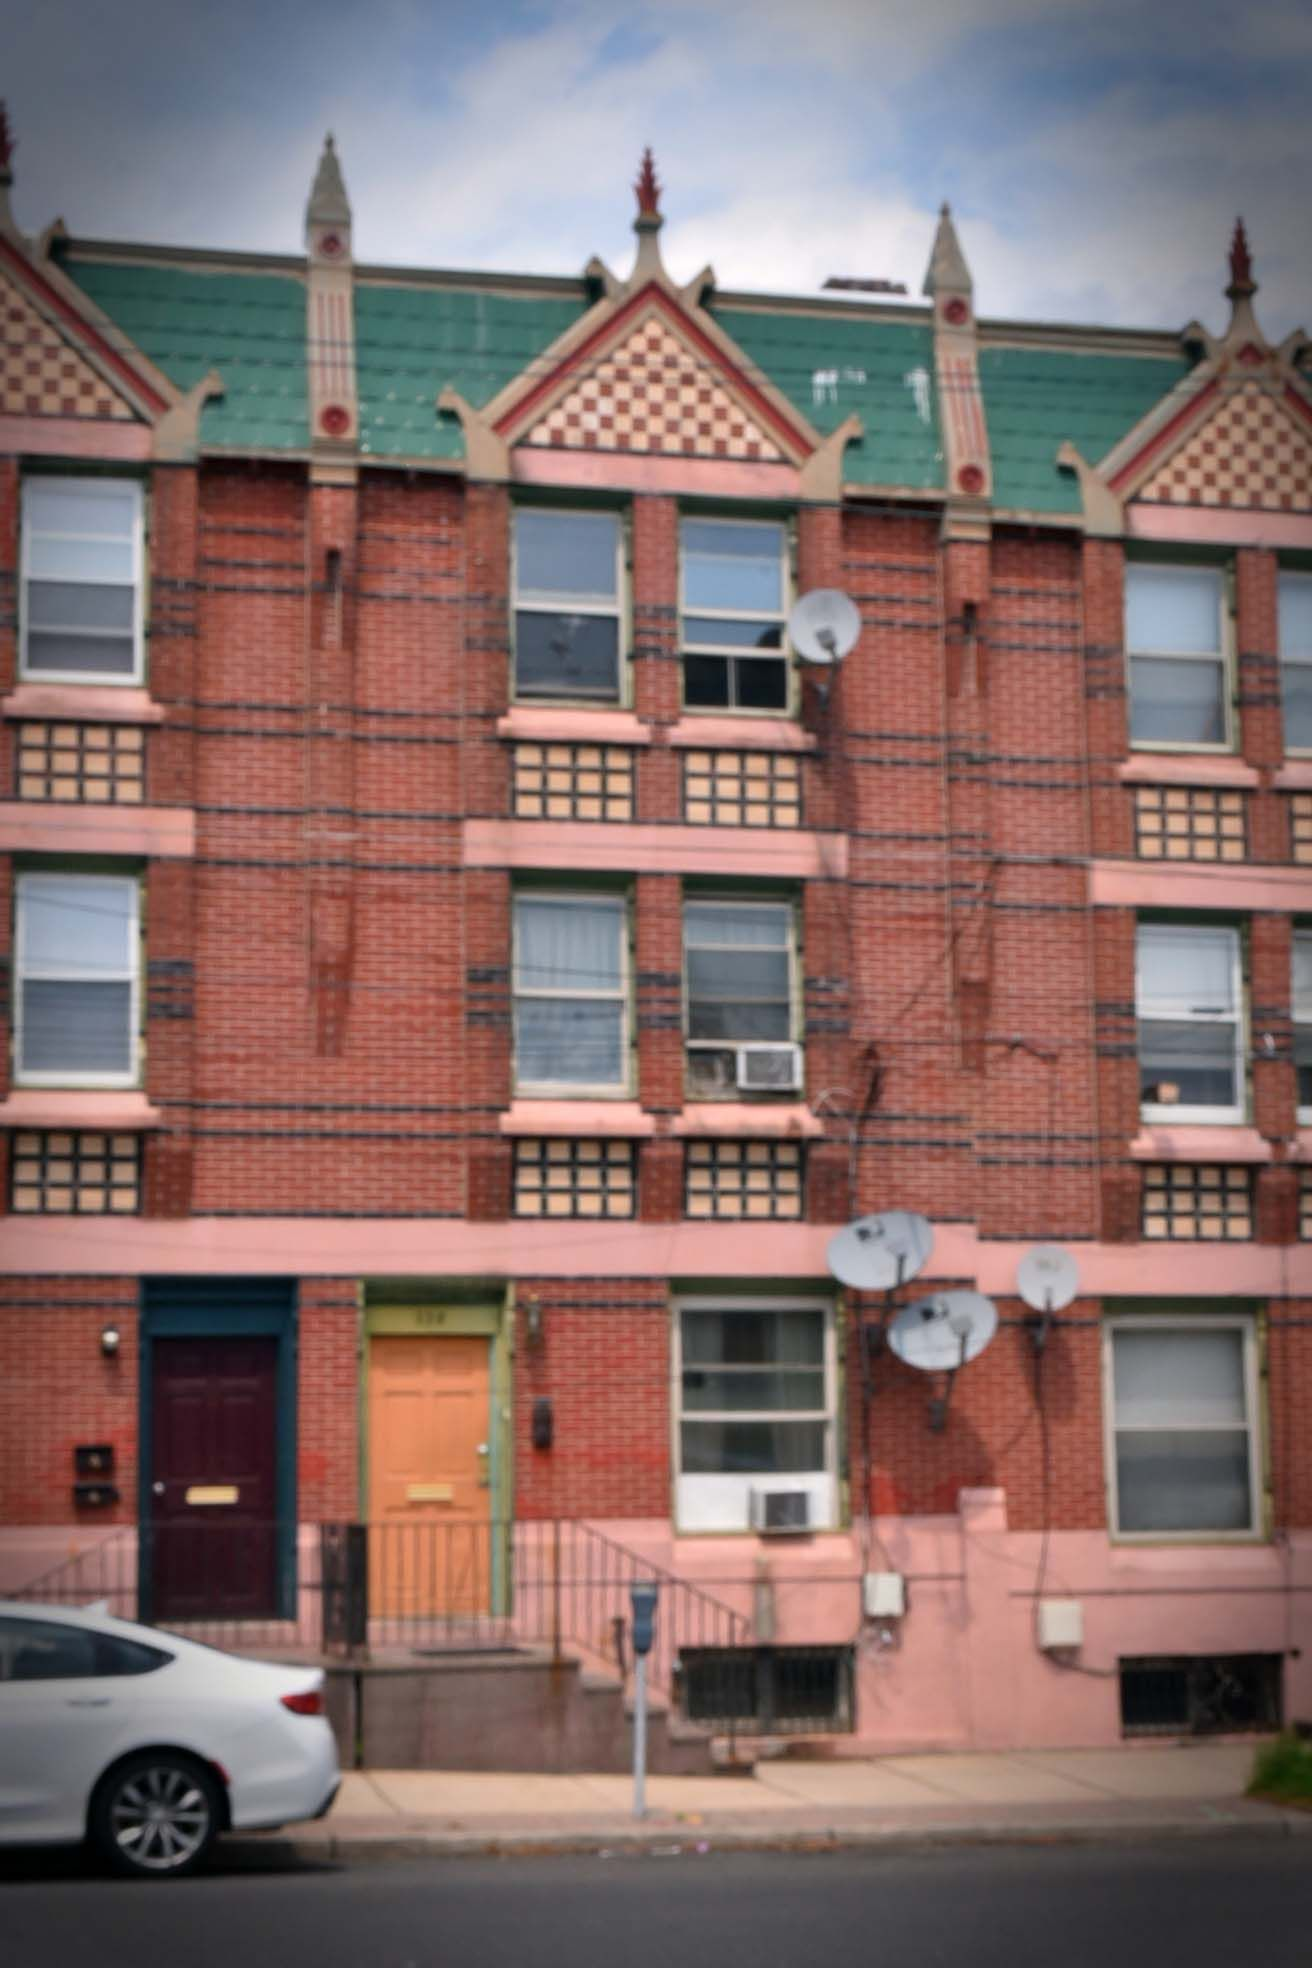 154 W Hanover St, Trenton, NJ